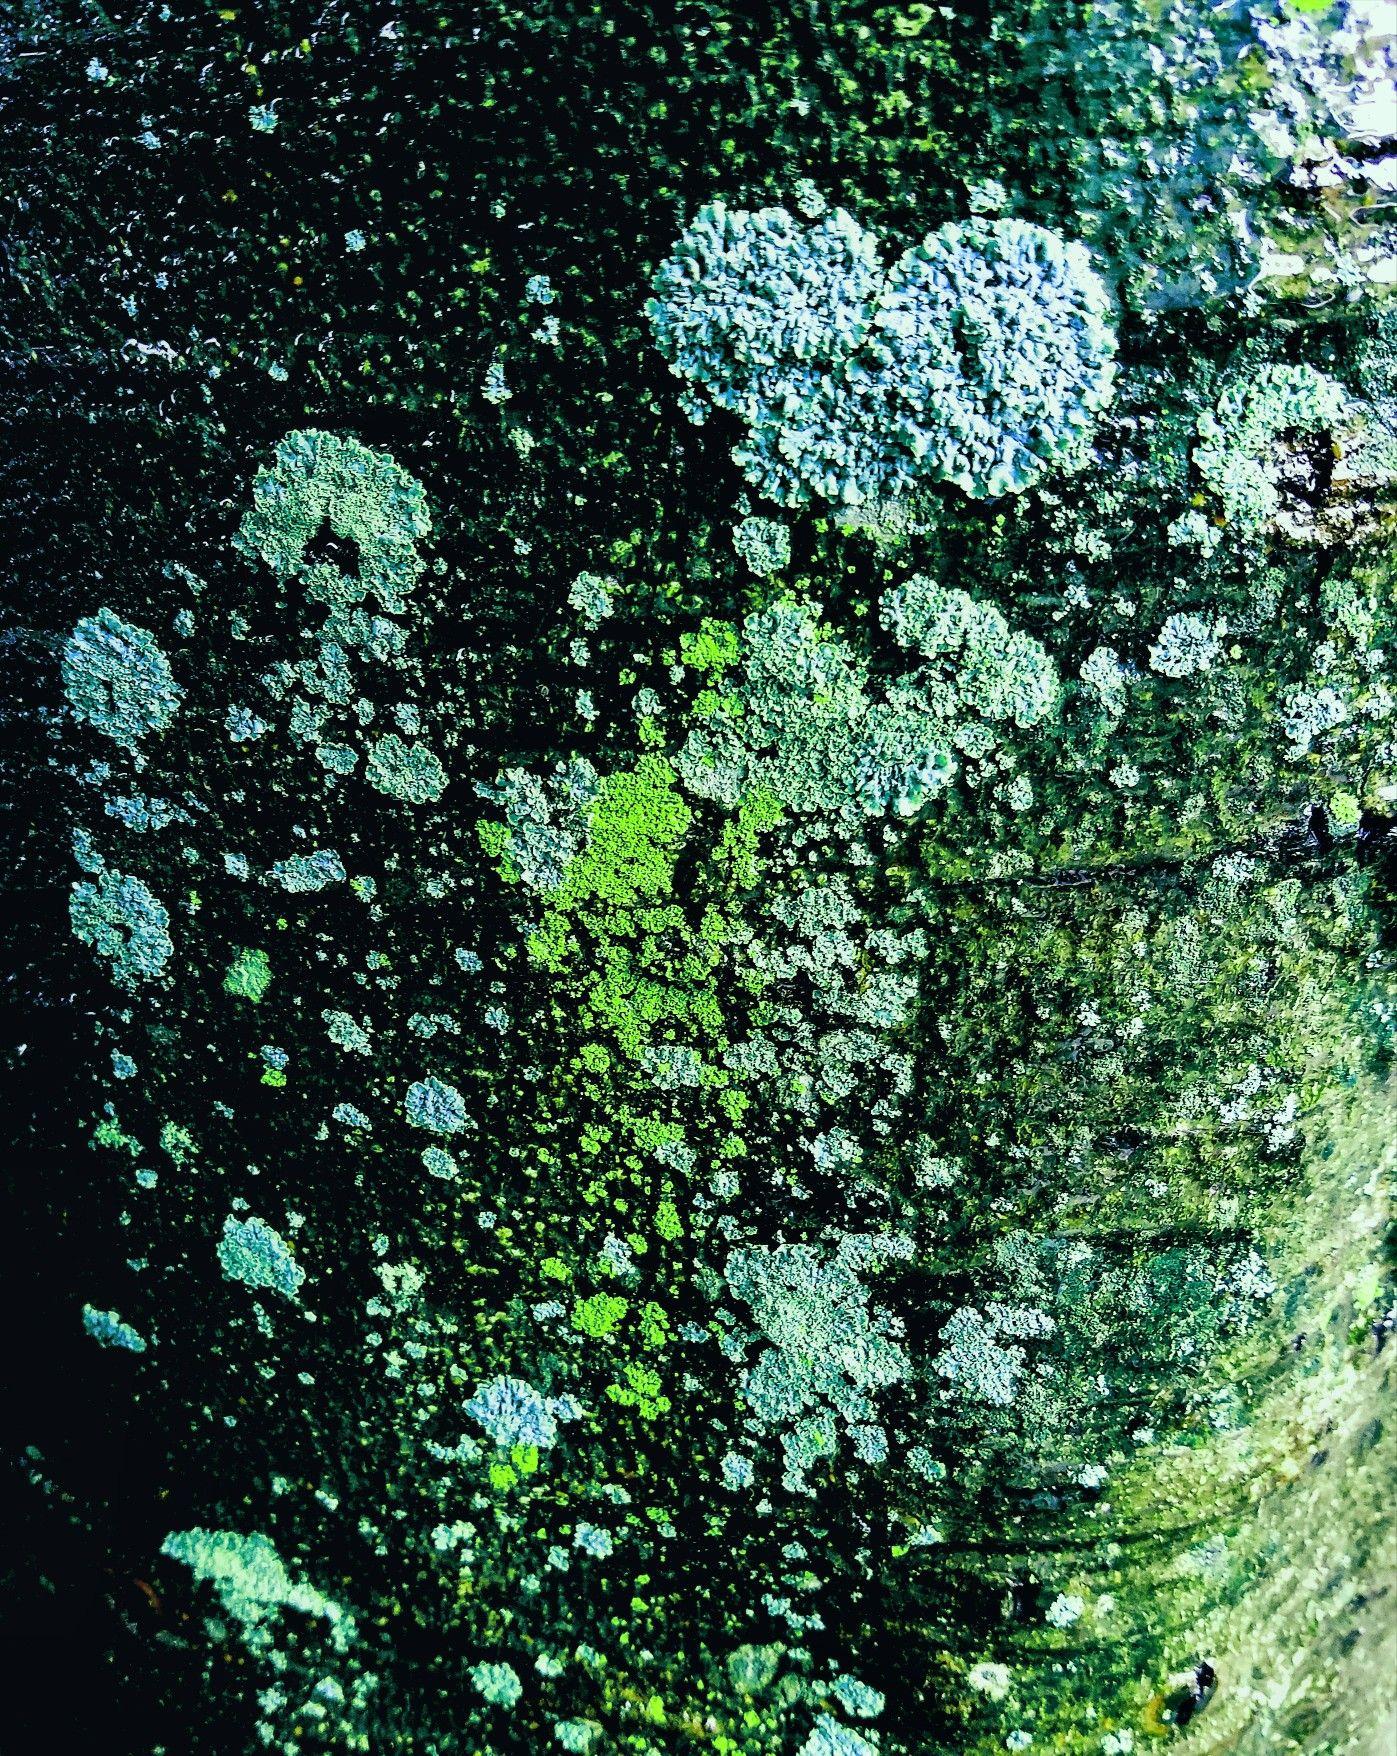 Lichens. Photography by #Koonartdesign, #textures, #tree